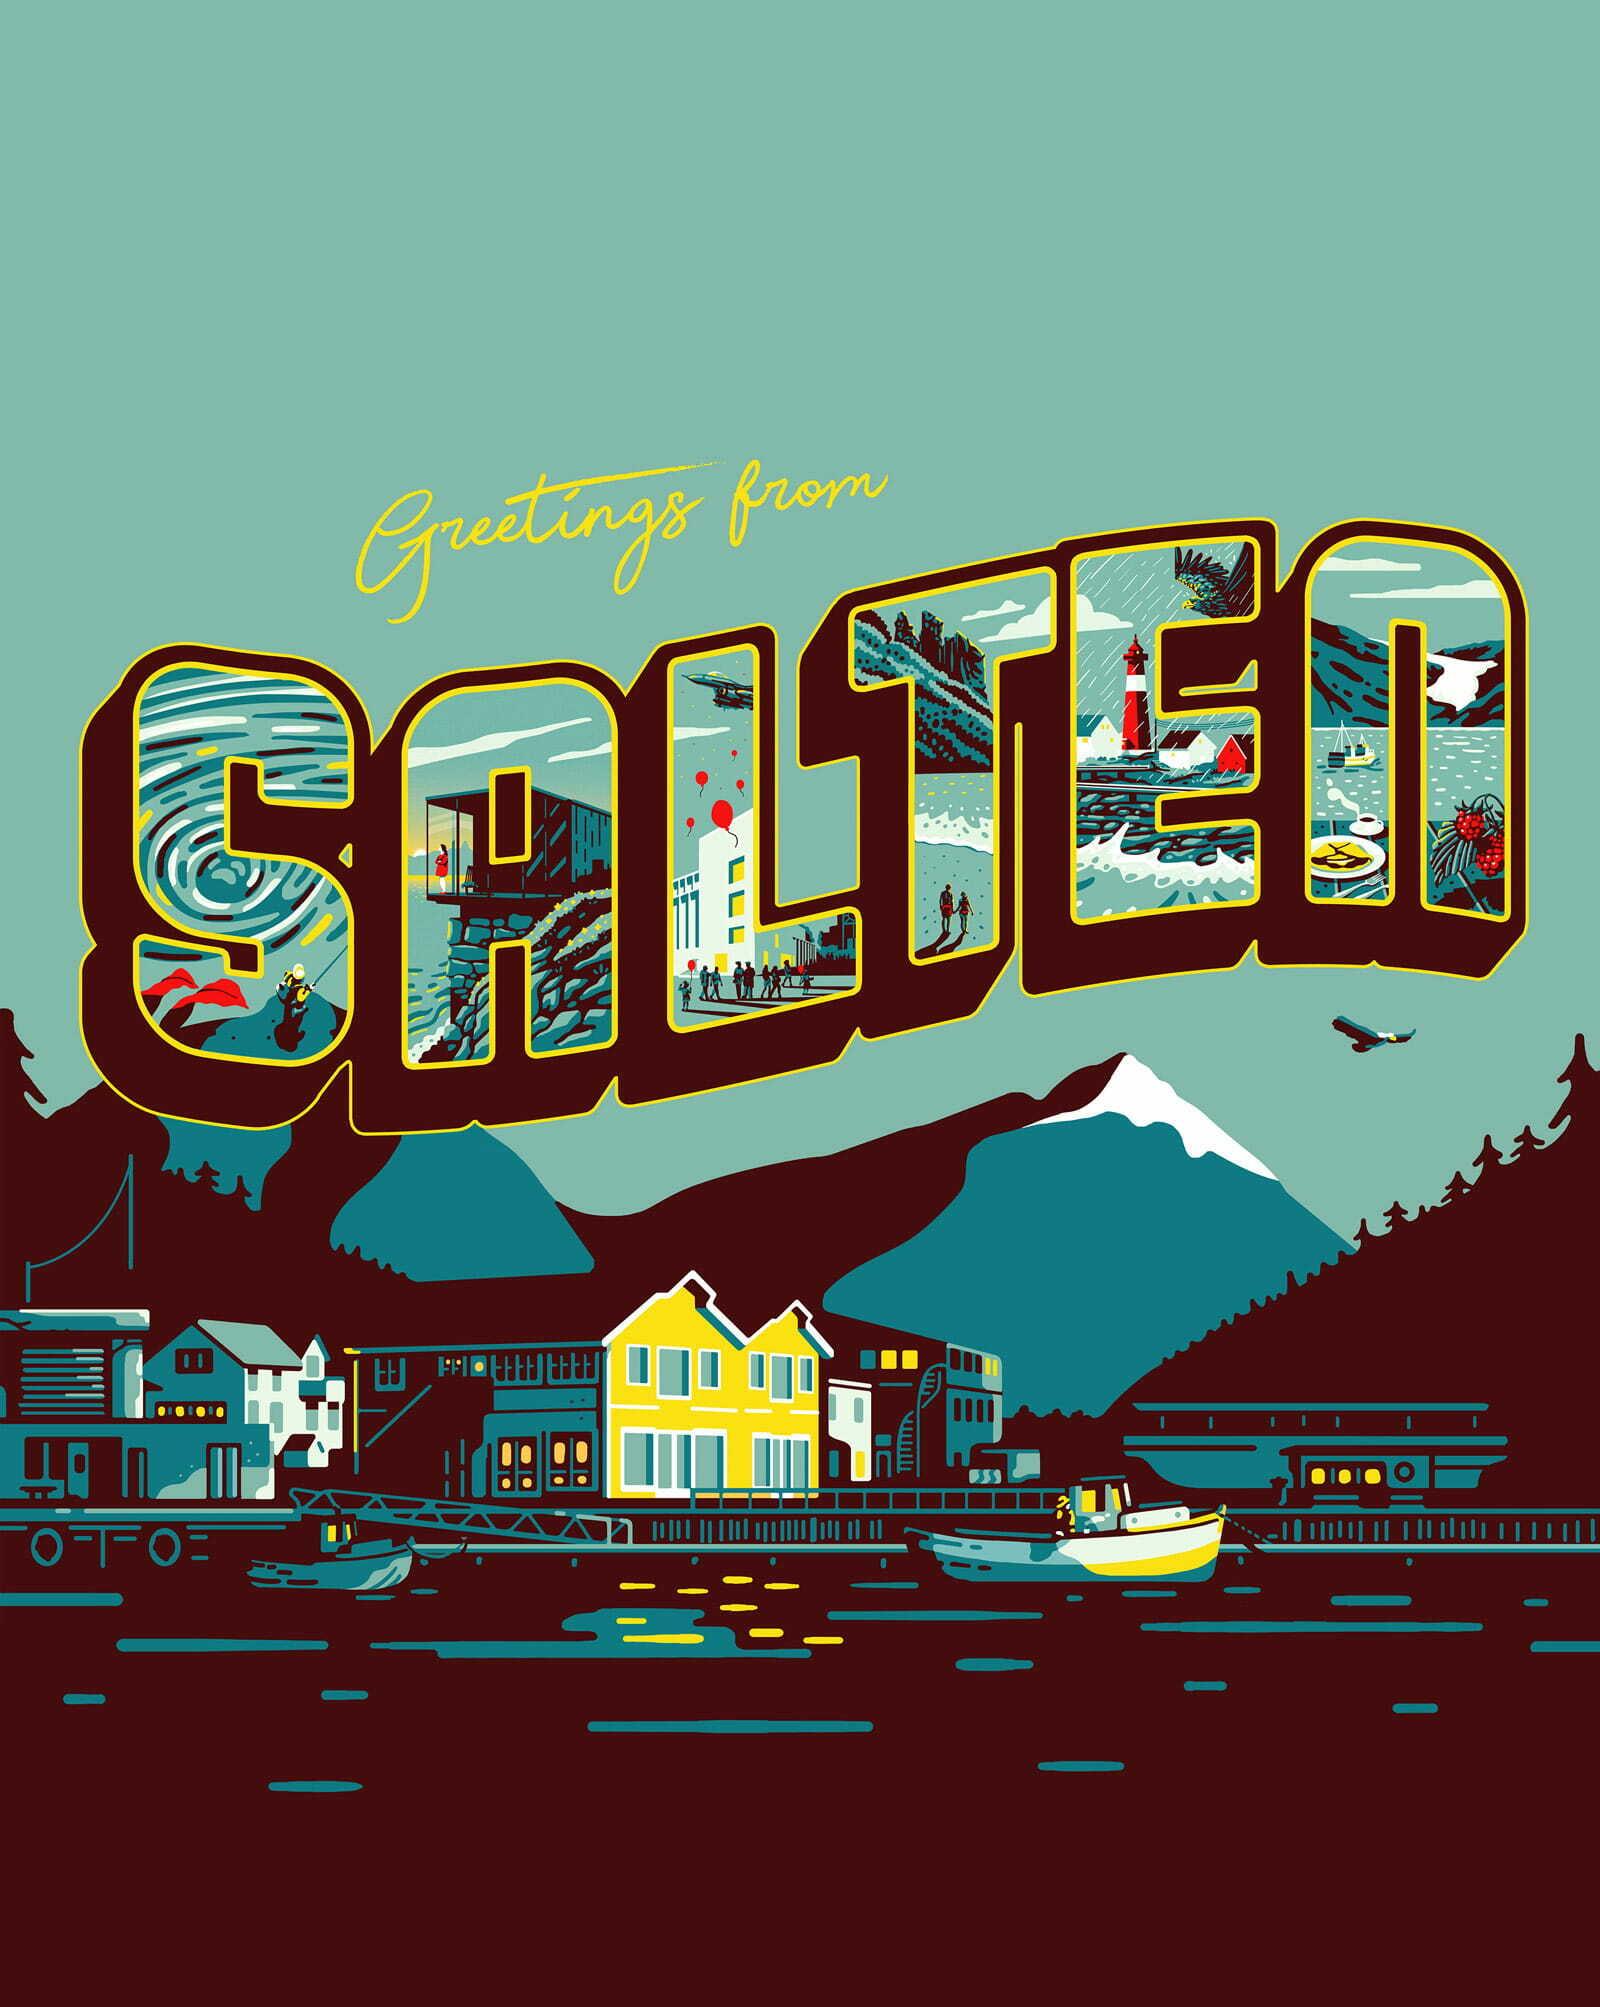 Greetings from Salten